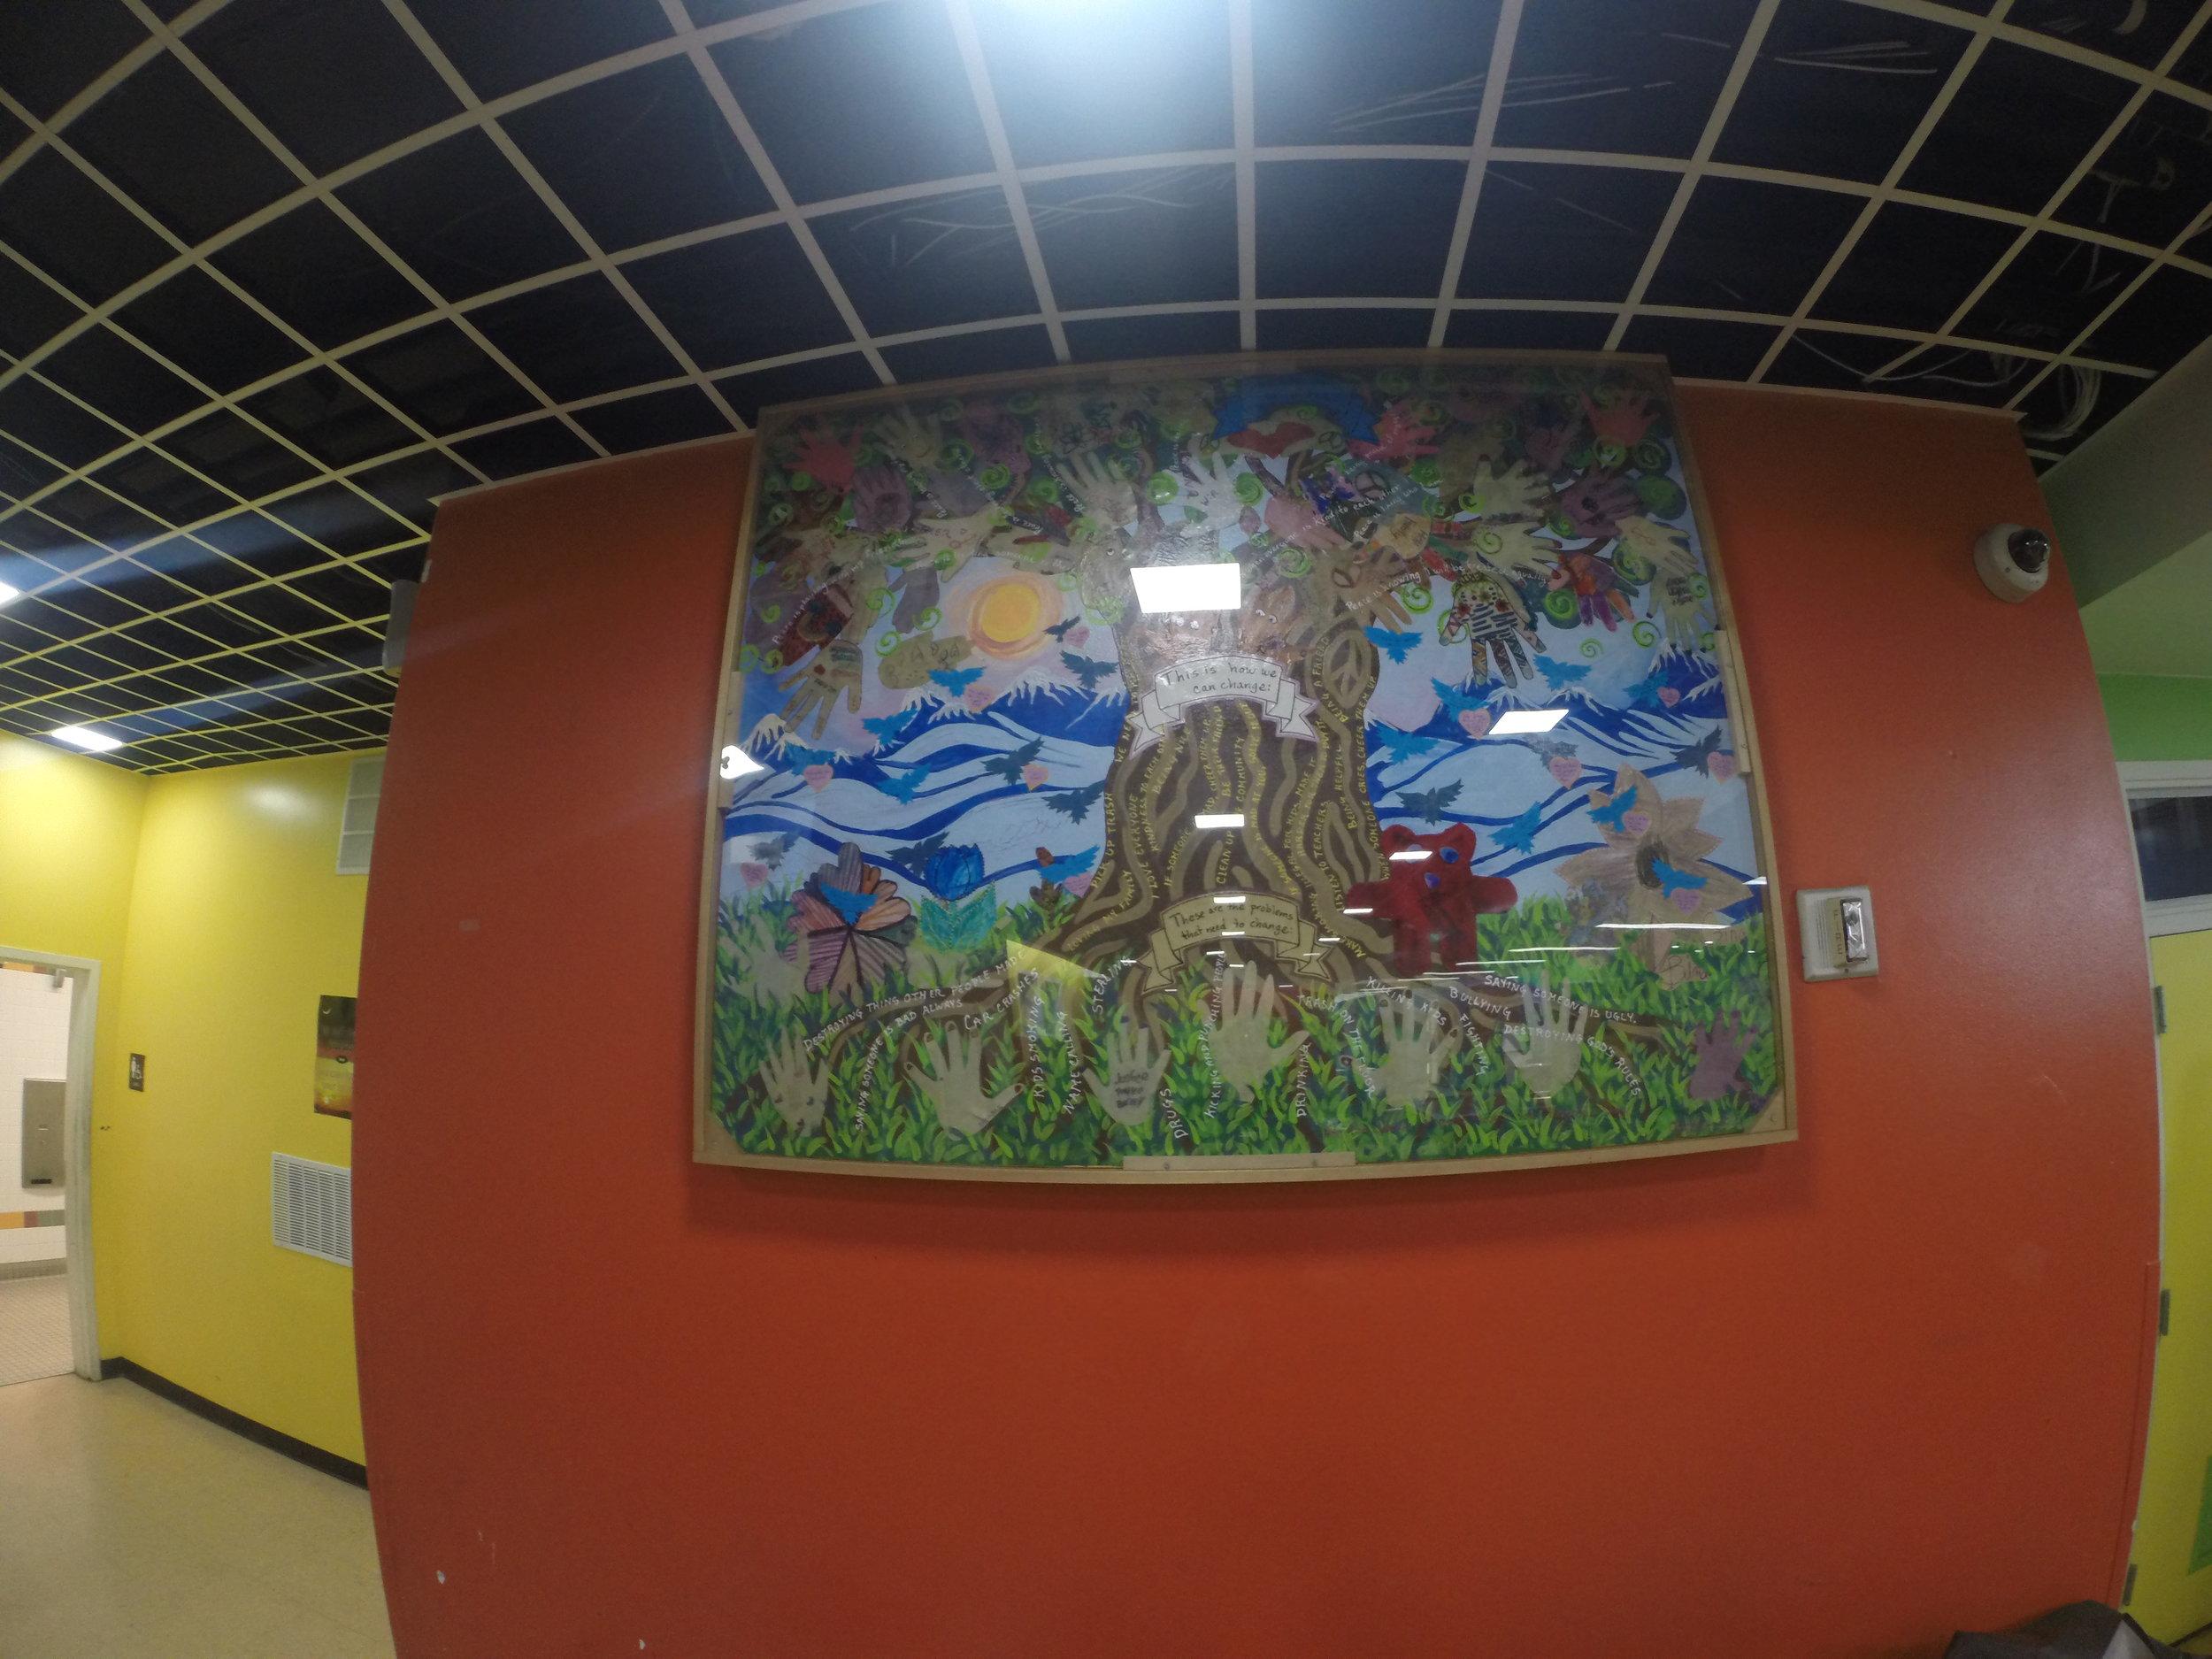 Artwork by local community kids